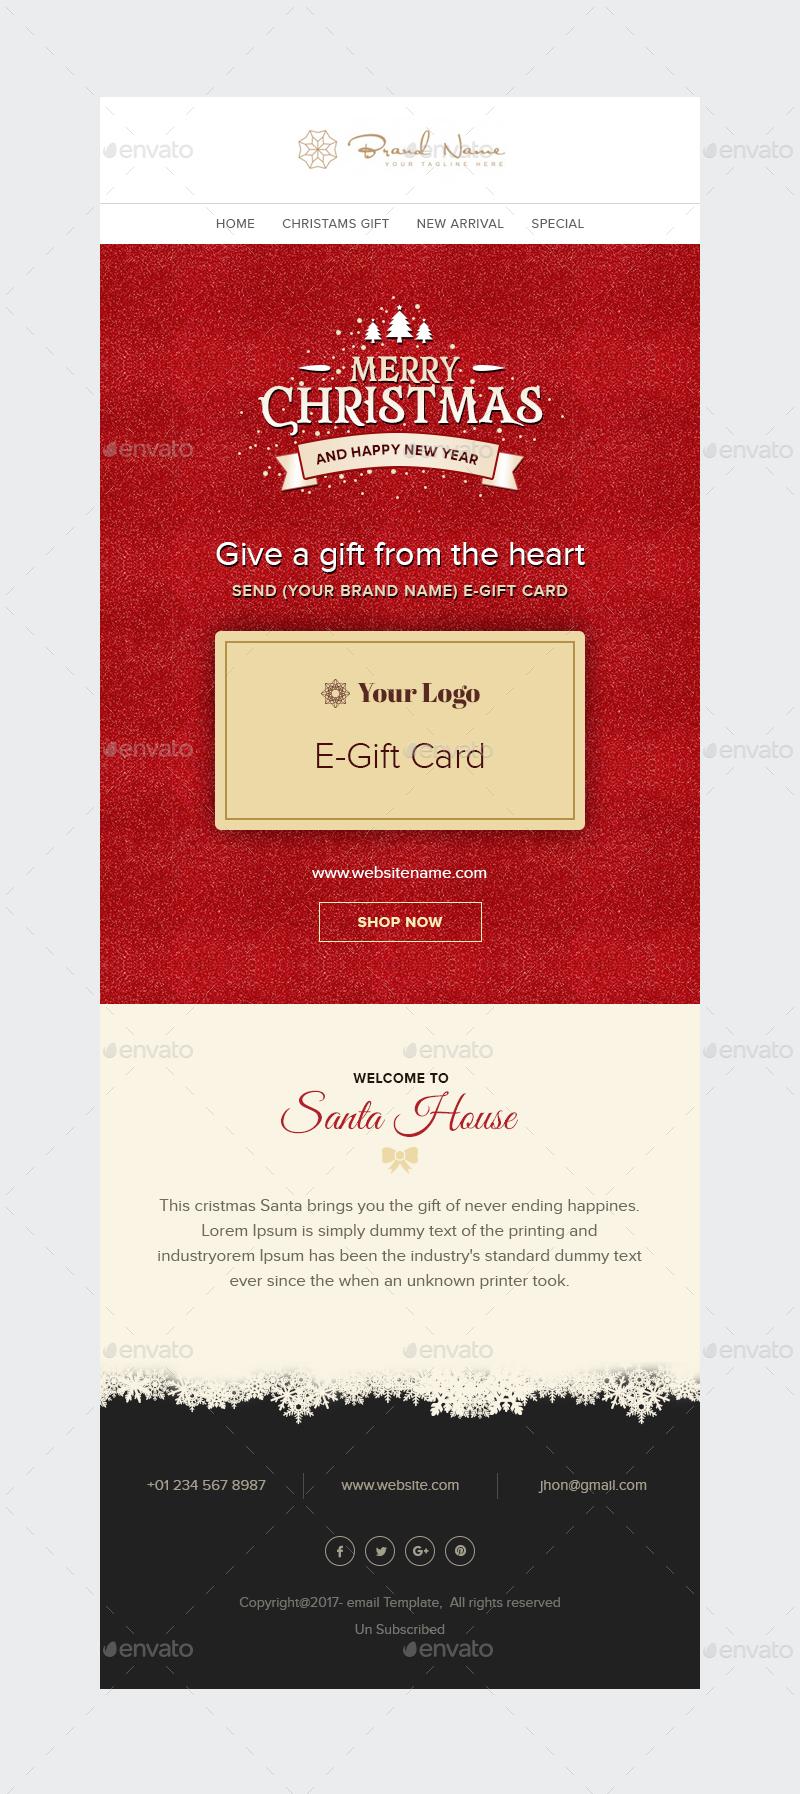 X mas e gift christmas e gift card email template psd by preview01 christmas e gift card yelopaper Gallery